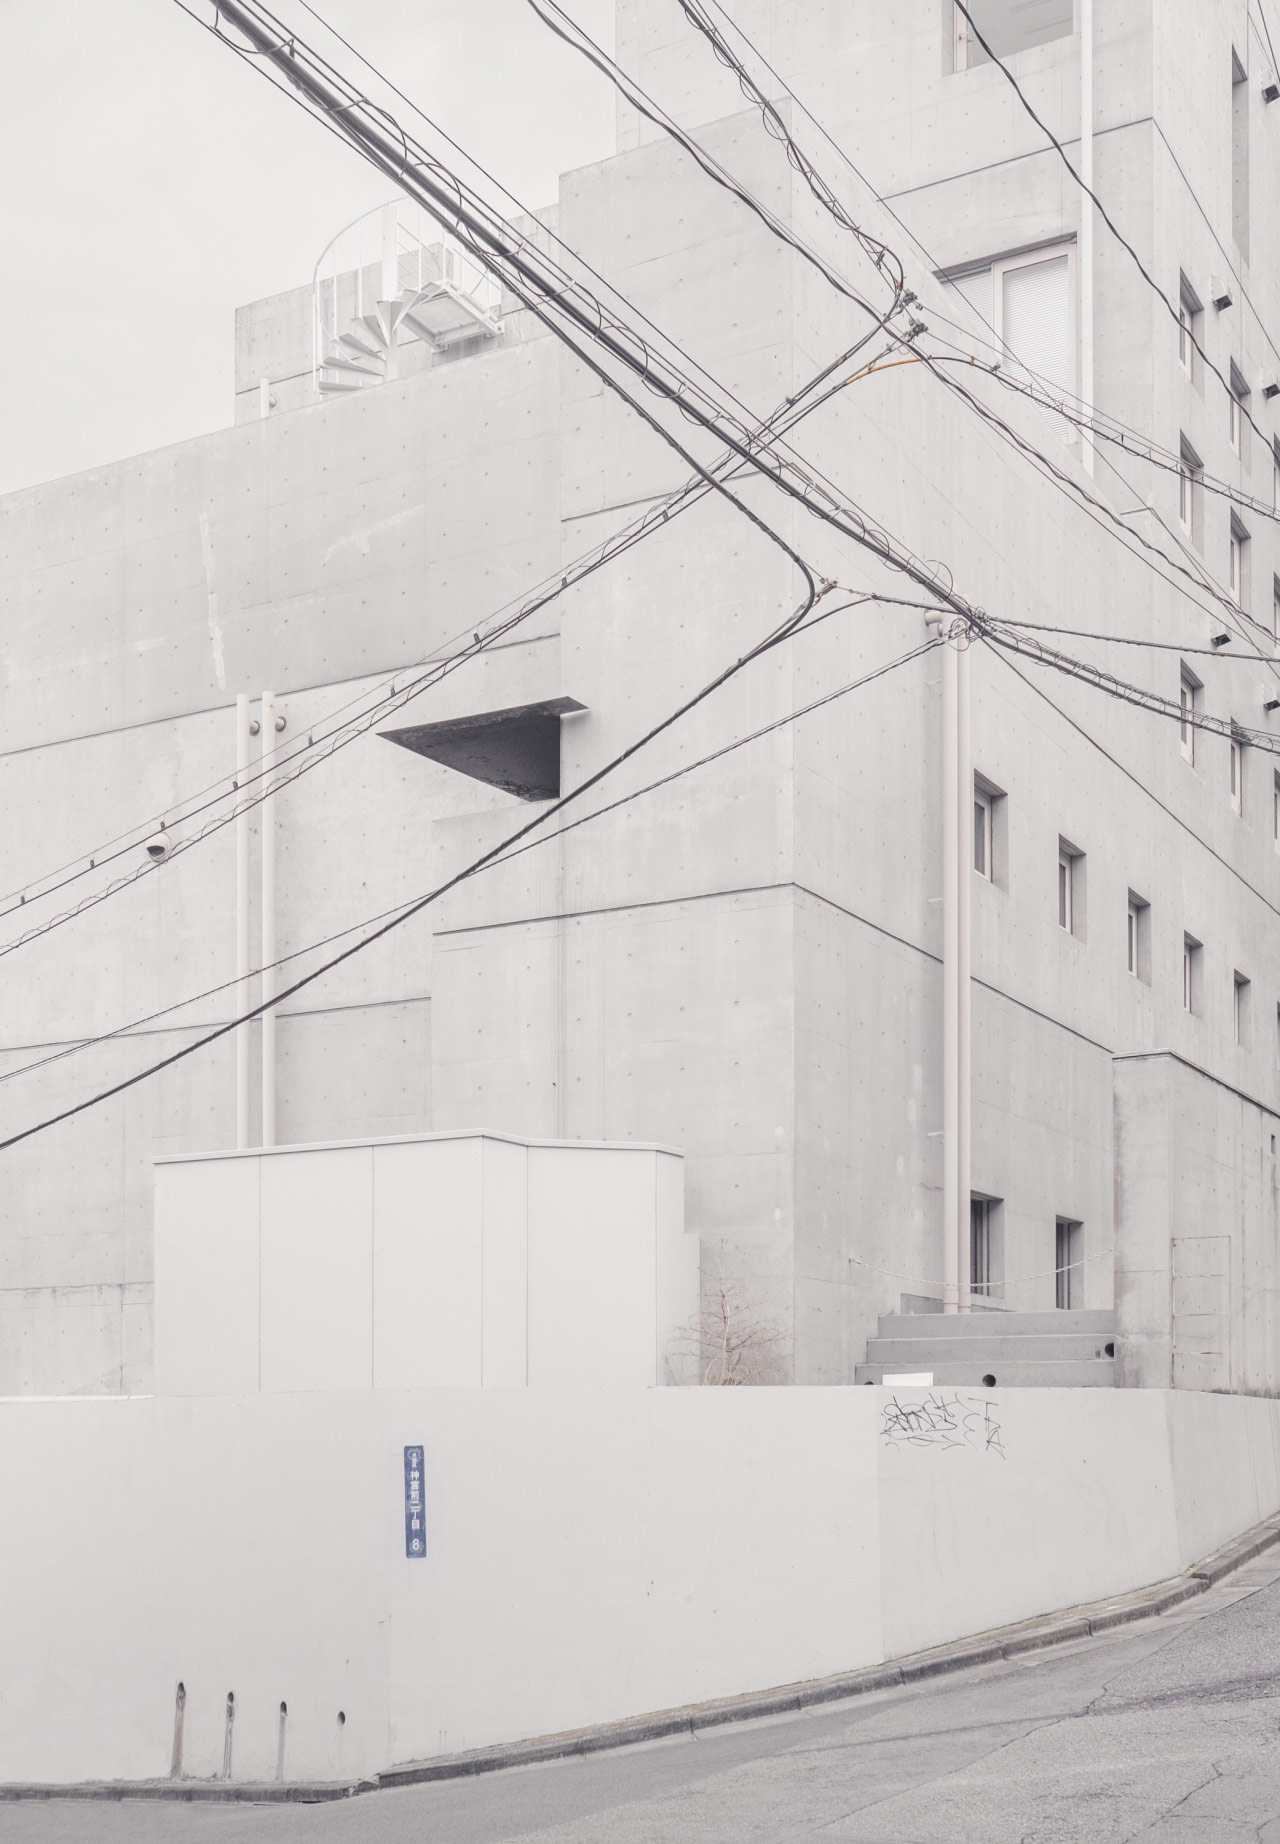 Surreal Photos of Japan and East Asia by Architect and Photographer Jan Vranovsky – BOOOOOOOM! – CREATE * INSPIRE * COMMUNITY * ART * DESIGN * MUSIC * FILM * PHOTO * PROJECTS